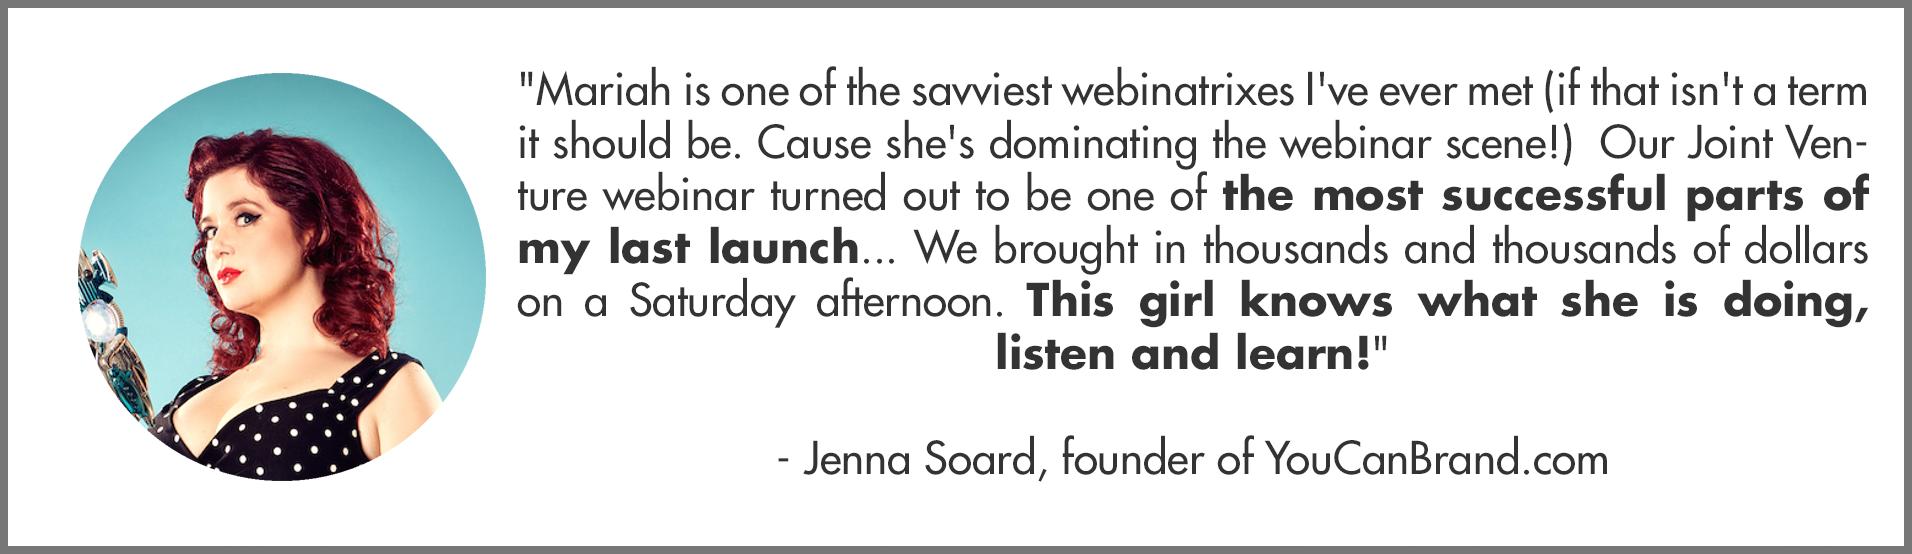 Profitable launch with webinars